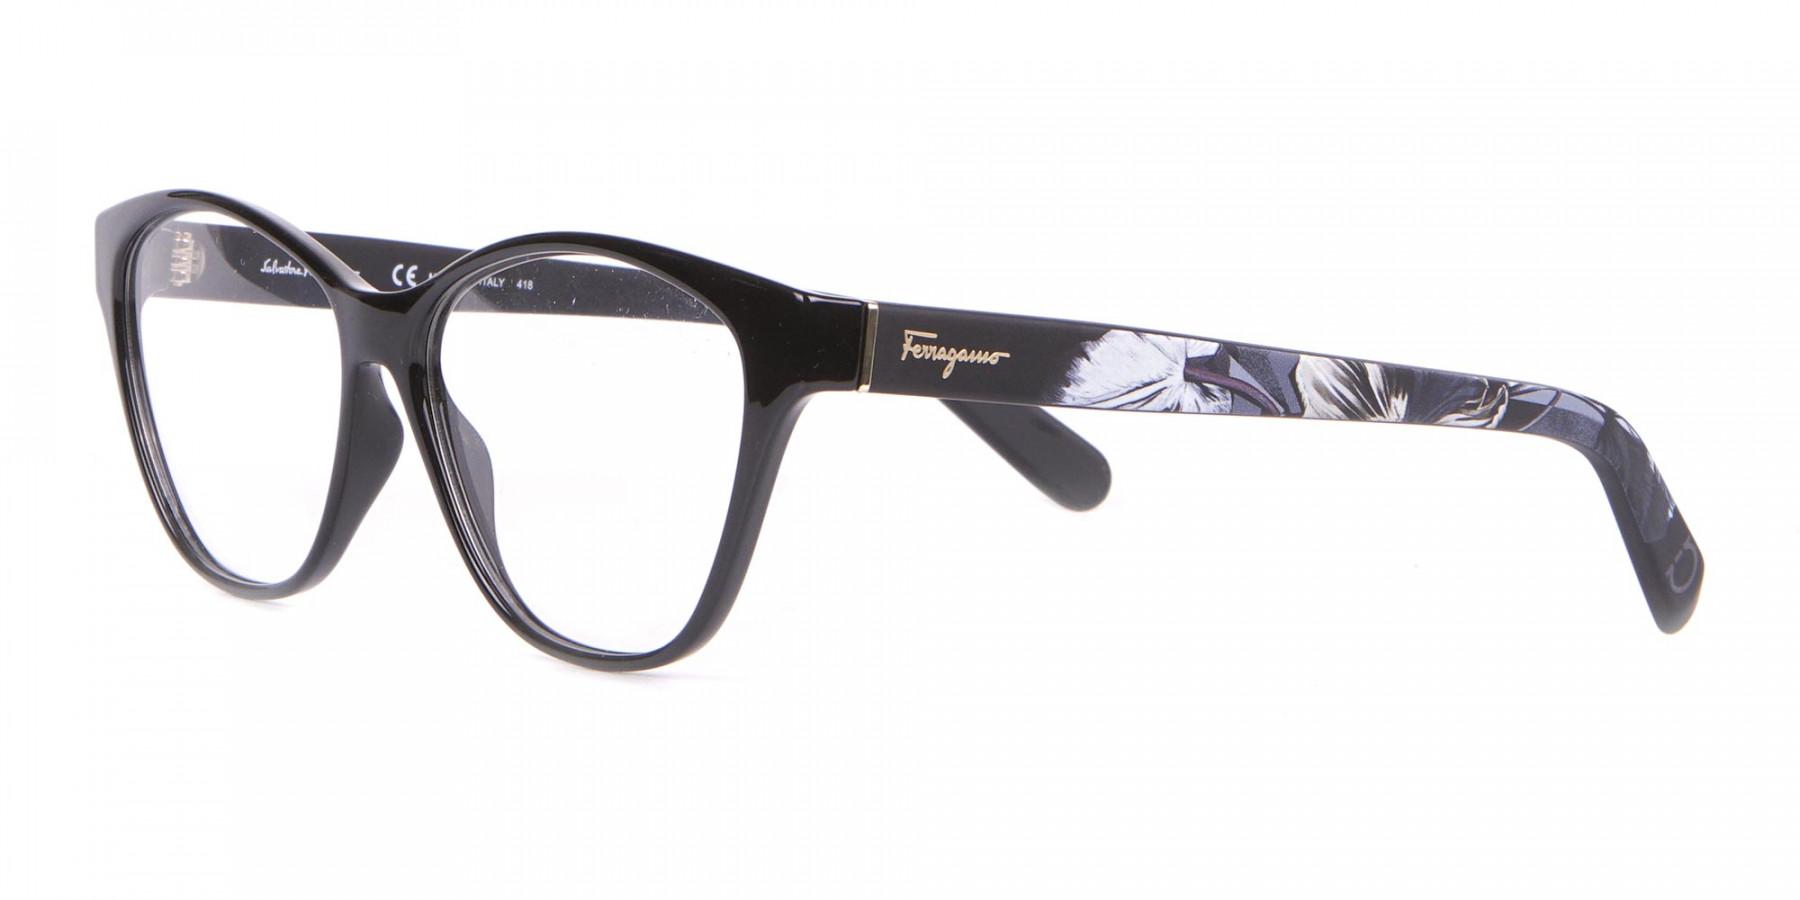 Salvatore Ferragamo SF2836 Women's Cat Eye Glasses Black-1